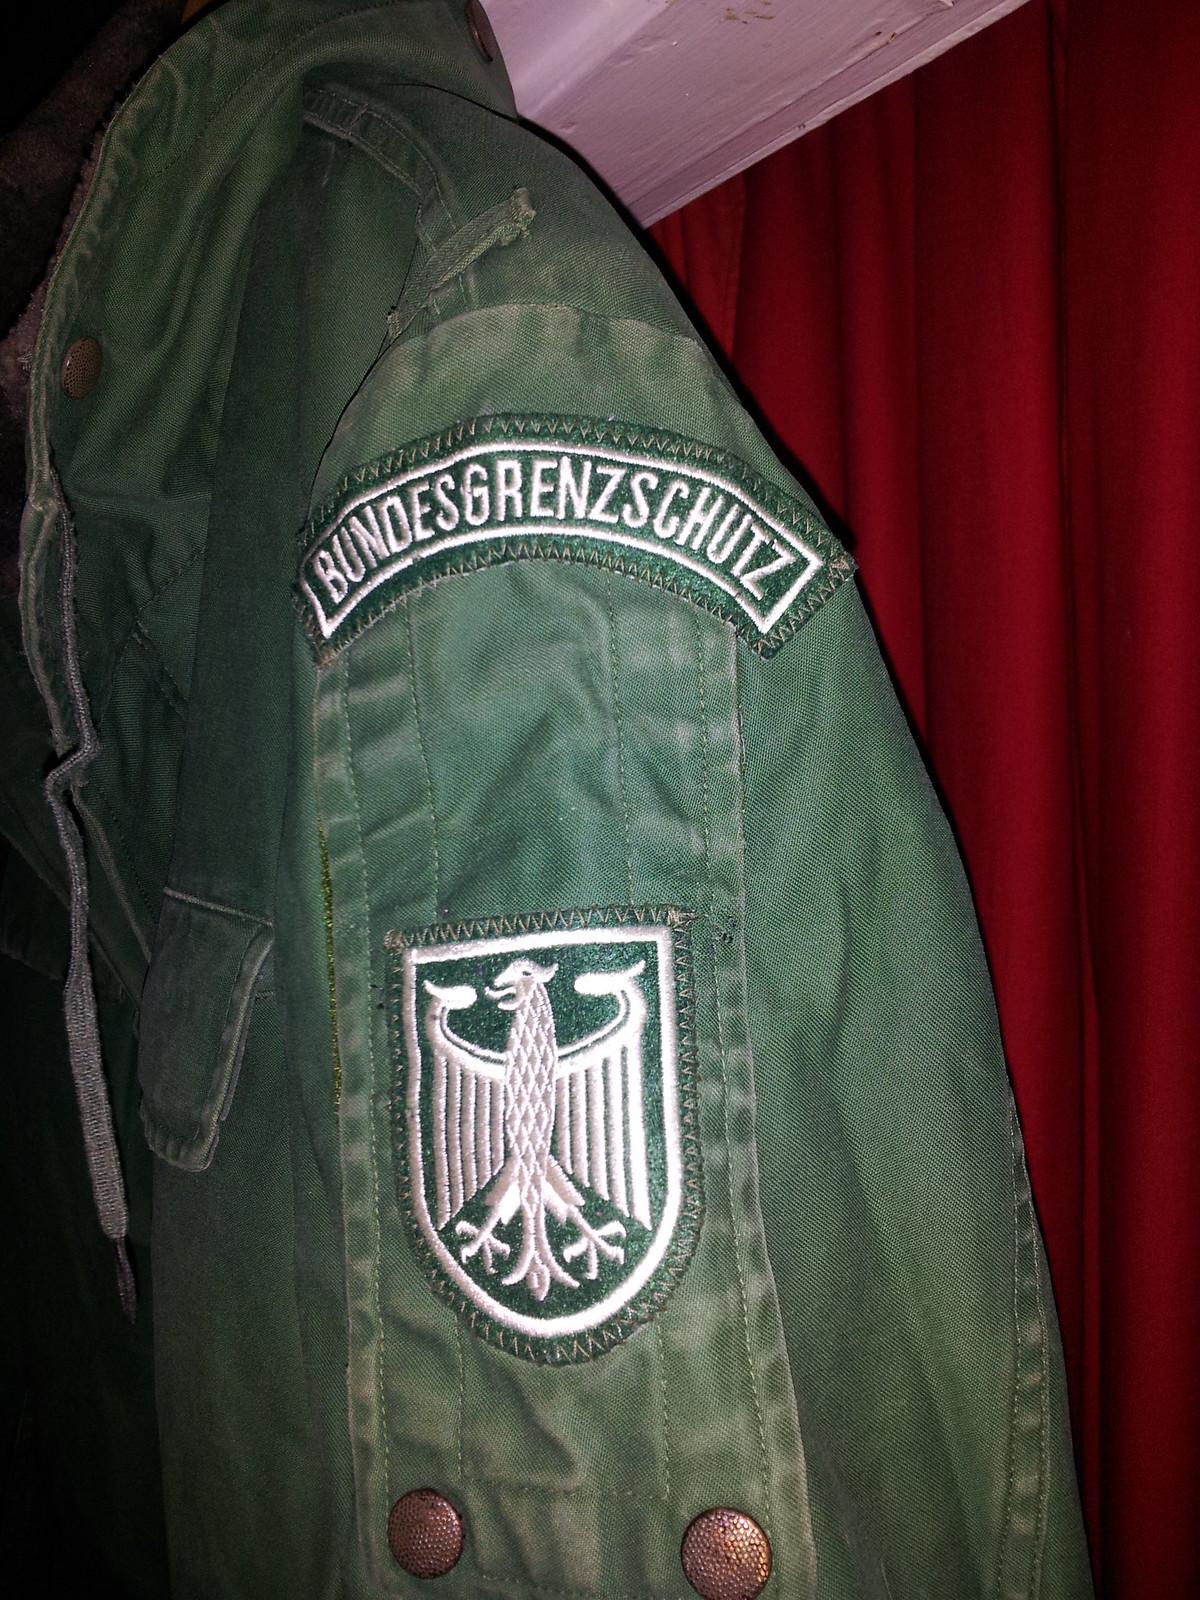 Bundesgrenzshutz patch 8298011627_91a6110ef2_h